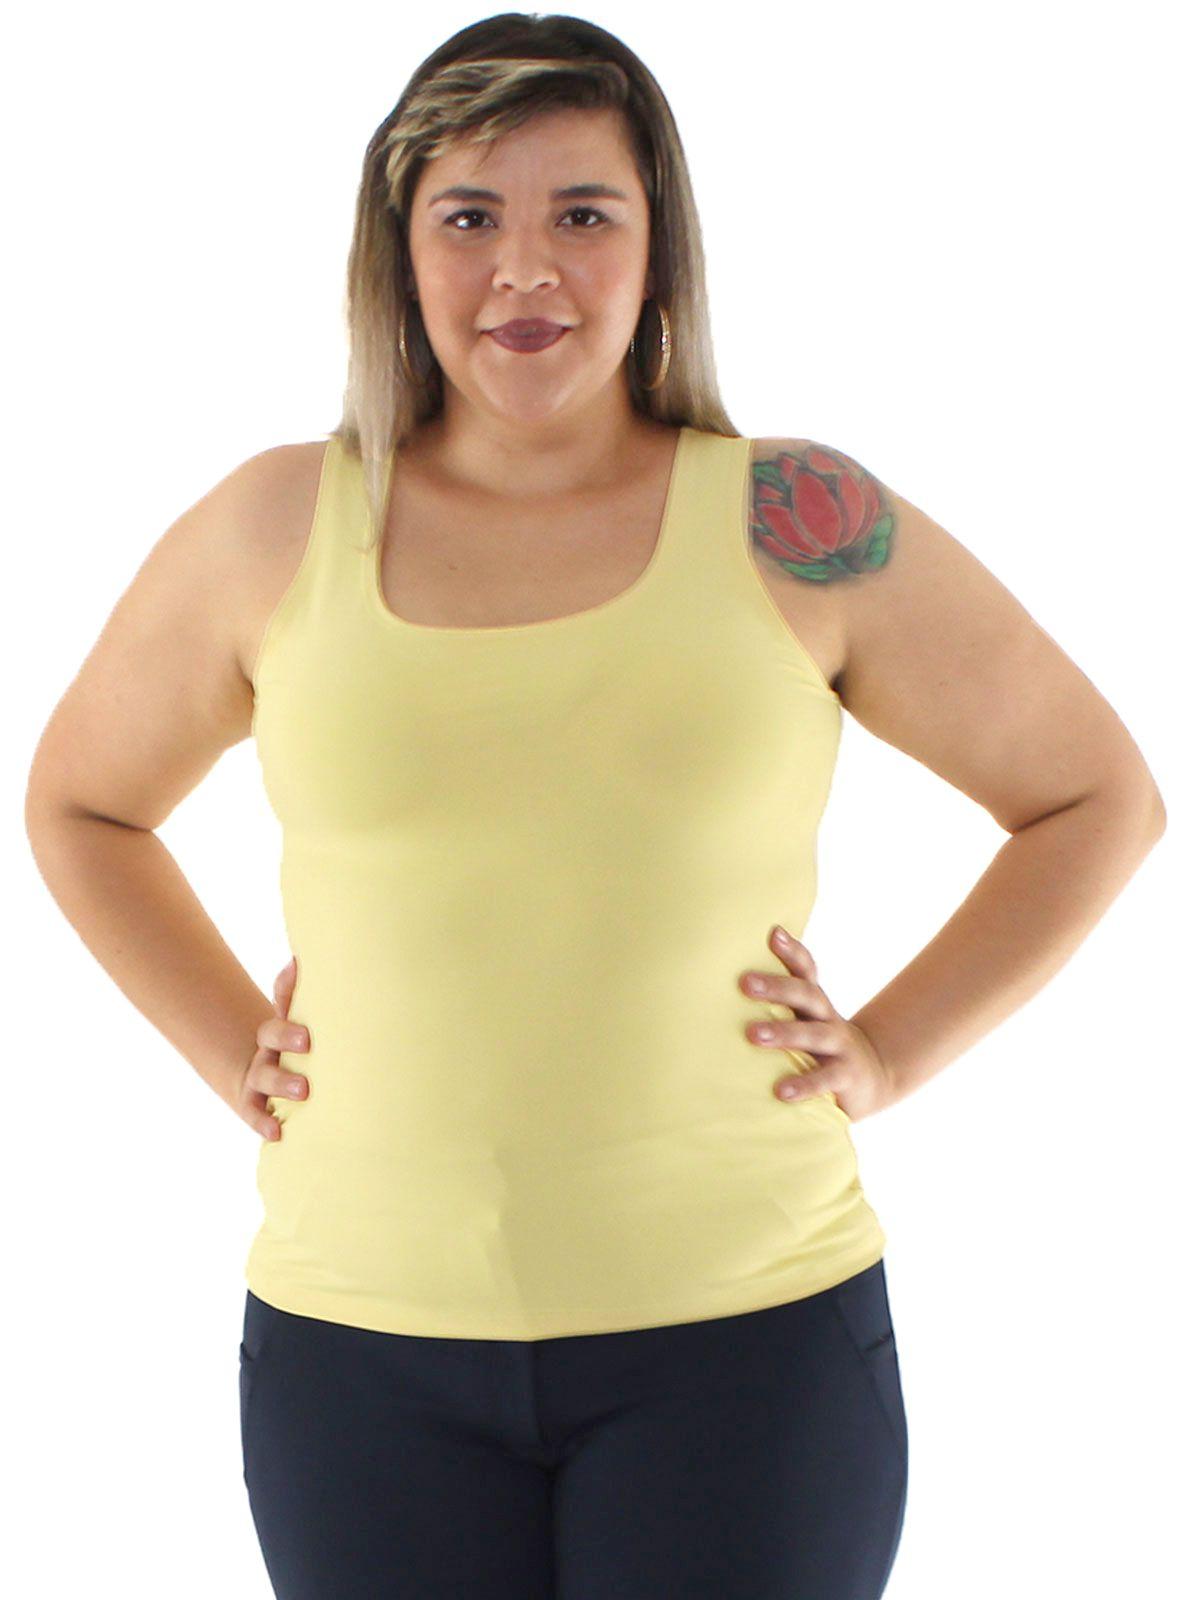 Regata Plus Size Feminina Lisa Fitness De Poliamida Amarelo